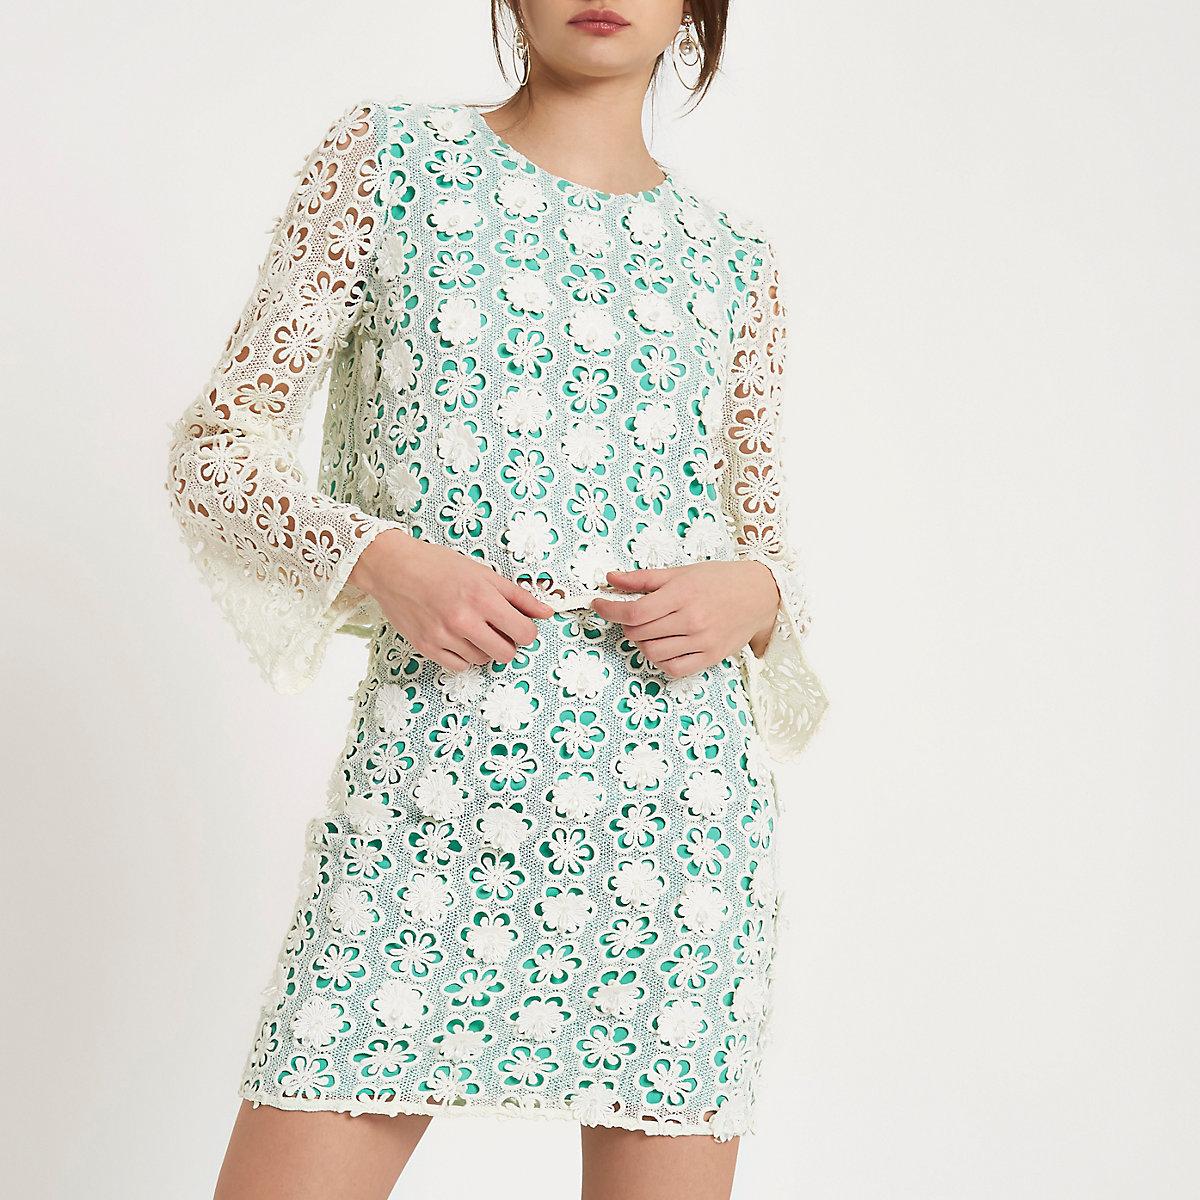 Green floral embellished lace mini skirt